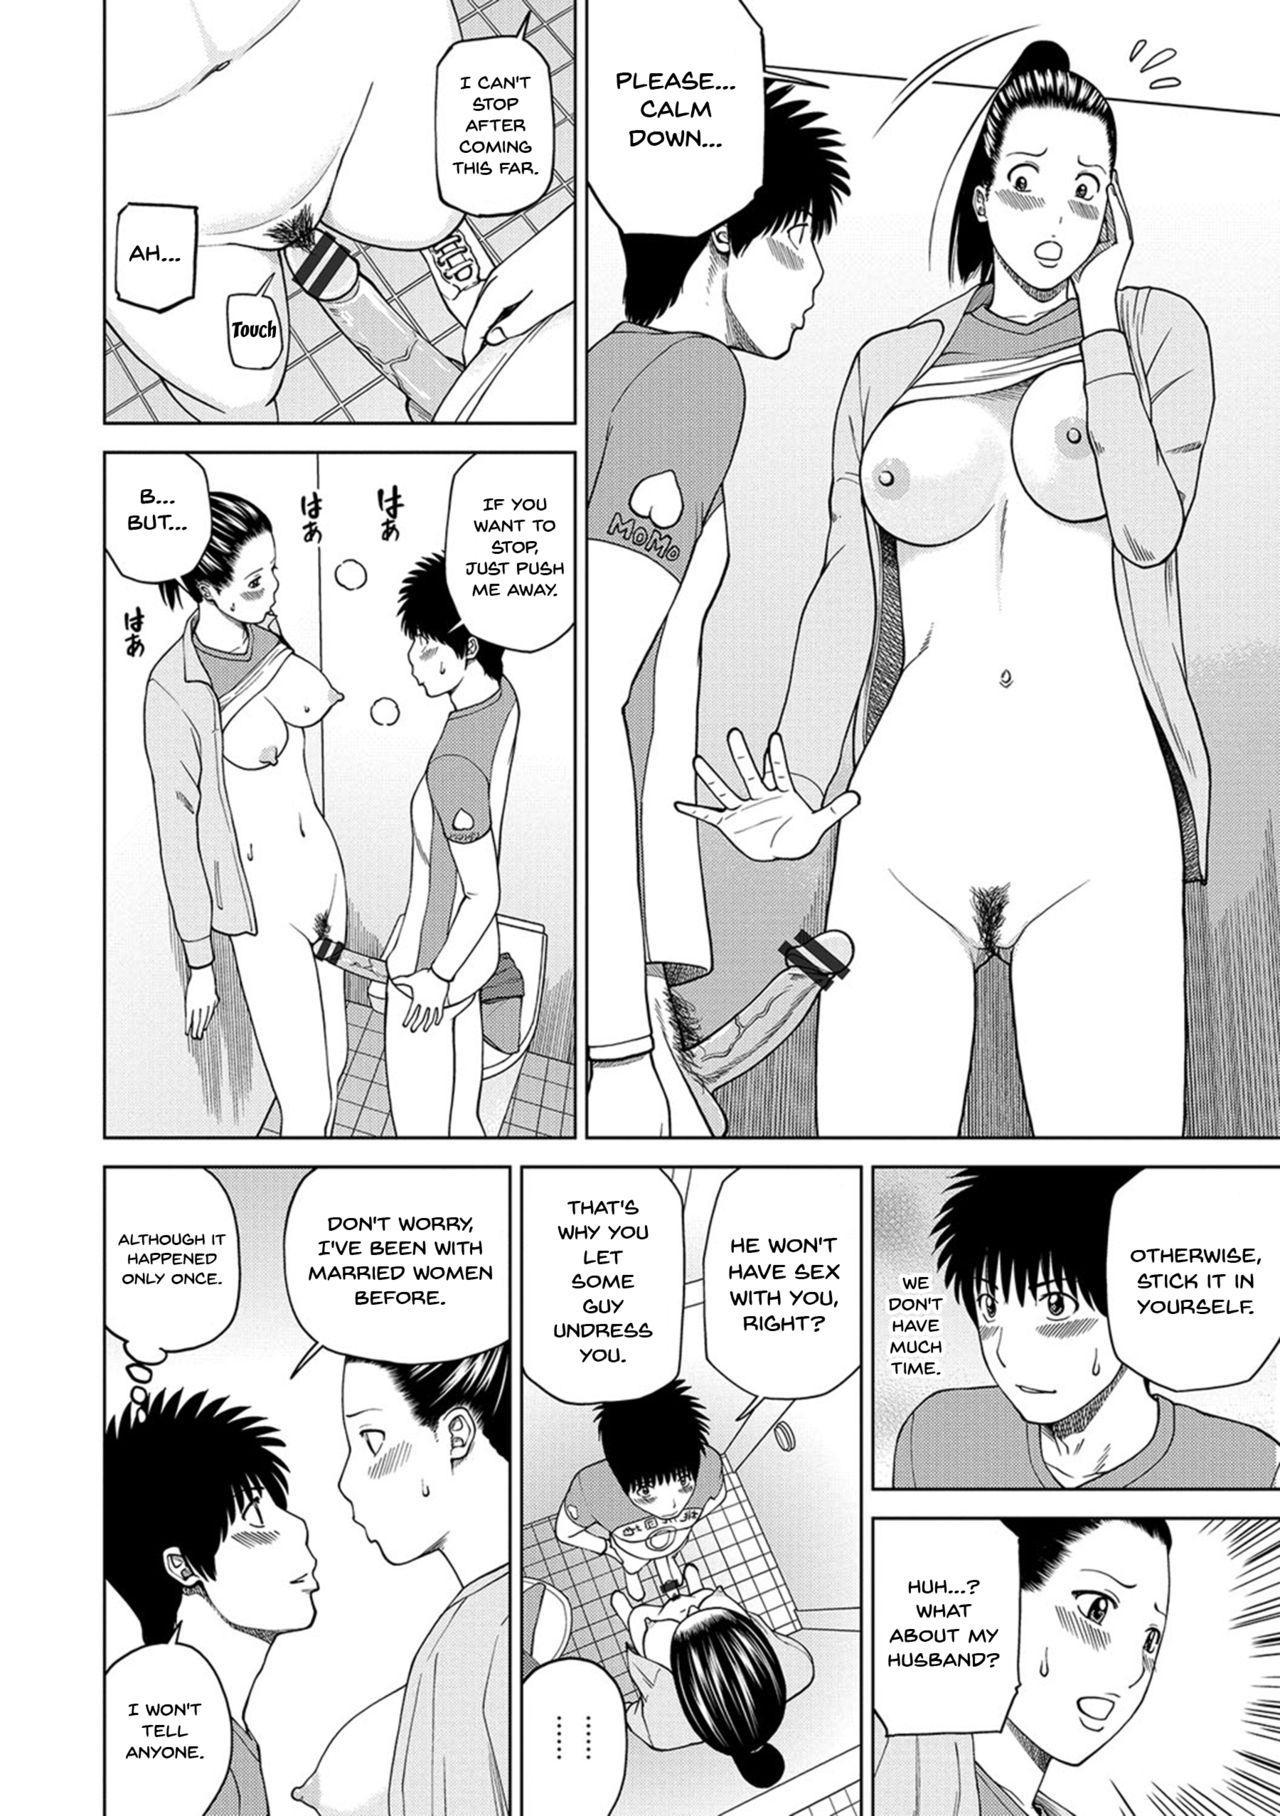 [Kuroki Hidehiko] Momojiri Danchi Mama-san Volley Doukoukai - Mom's Volley Ball | Momojiri District Mature Women's Volleyball Club Ch.1-9 [English] {Doujins.com} [Digital] 35